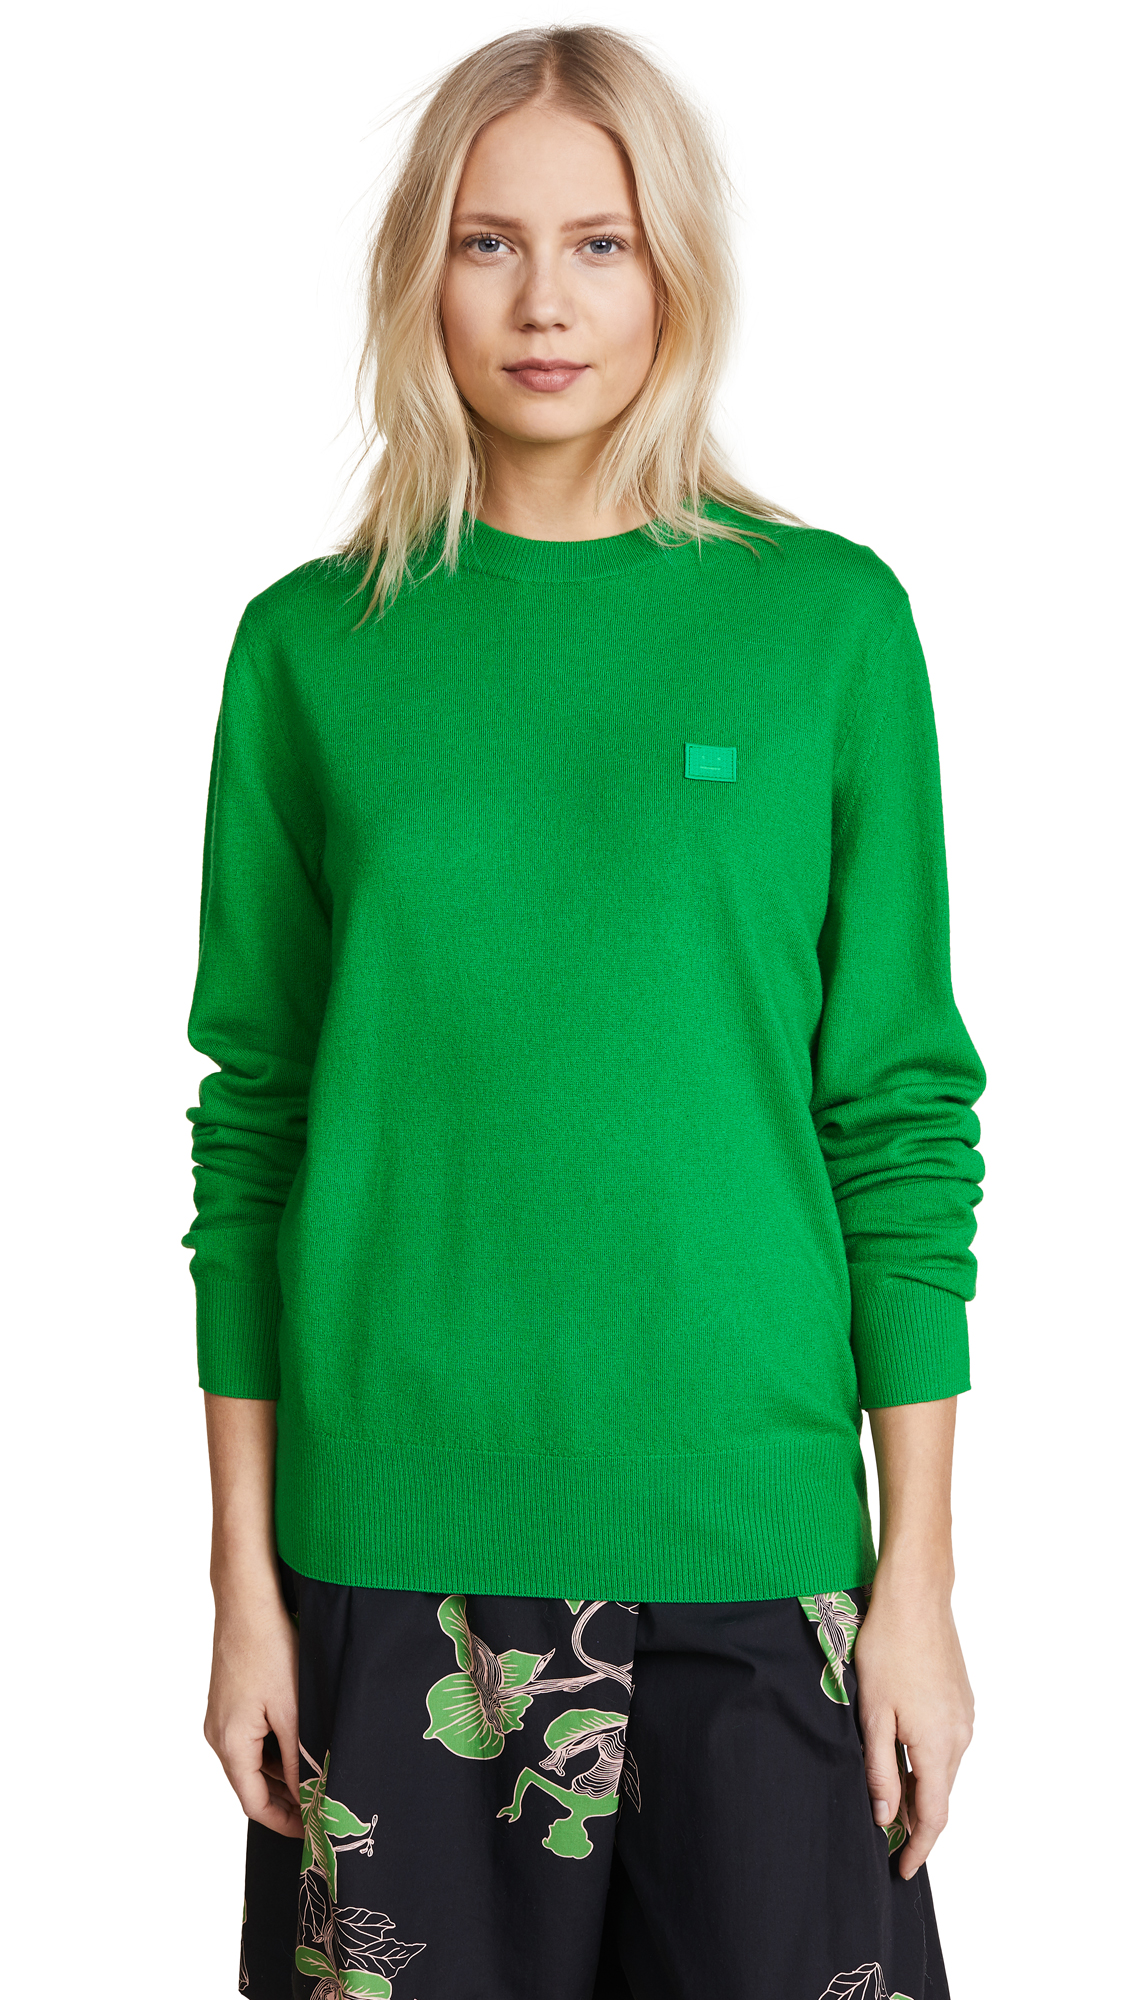 Acne Studios Nalon Sweater - Kelly Green